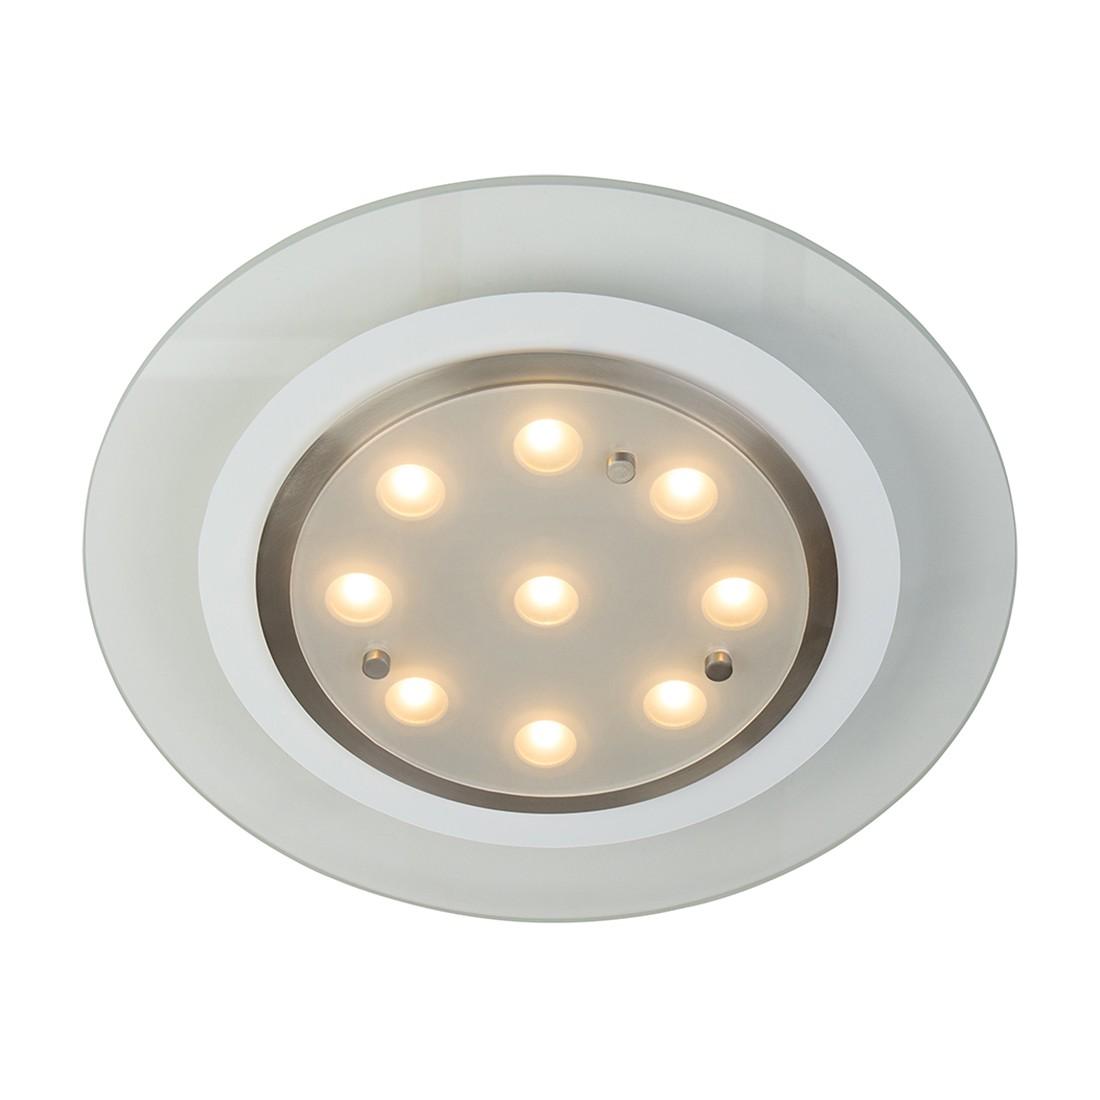 Lampada LED da soffitto, Steinhauer